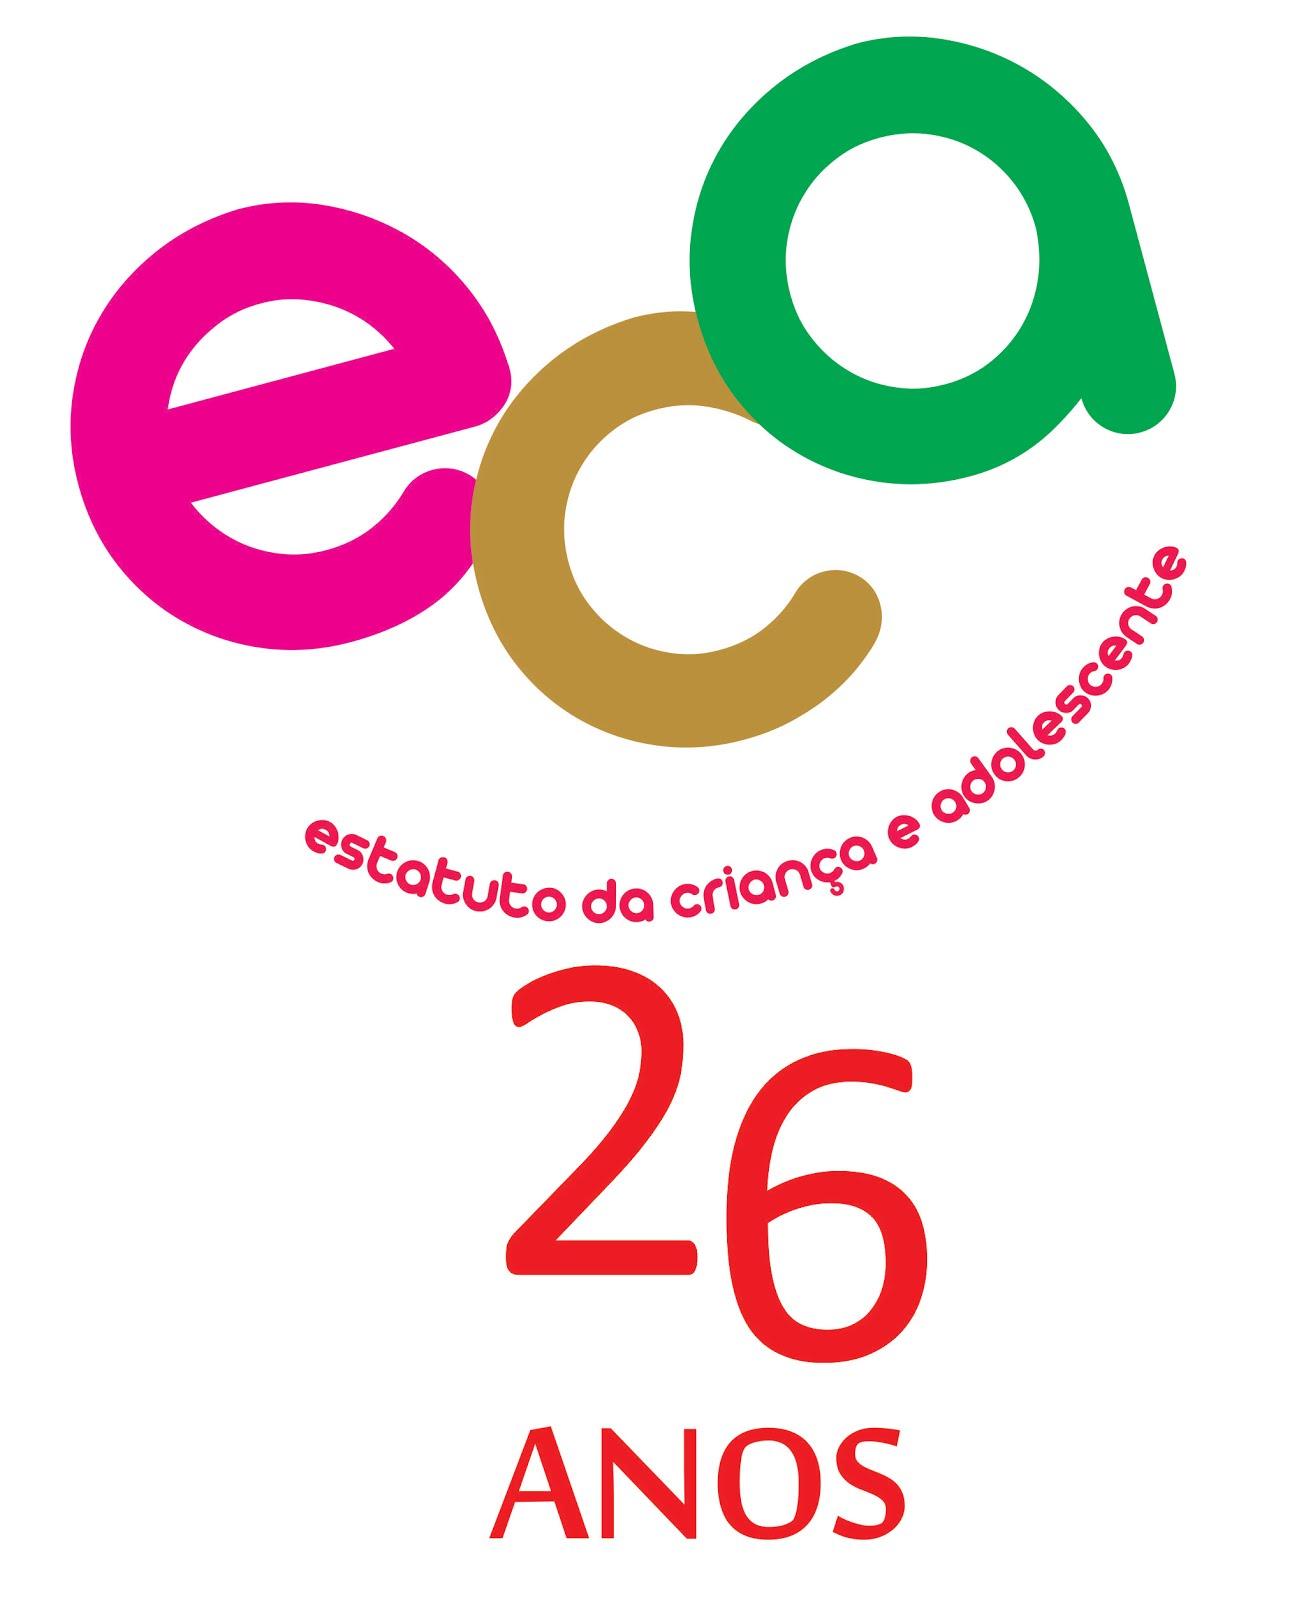 ECA 26 anos!